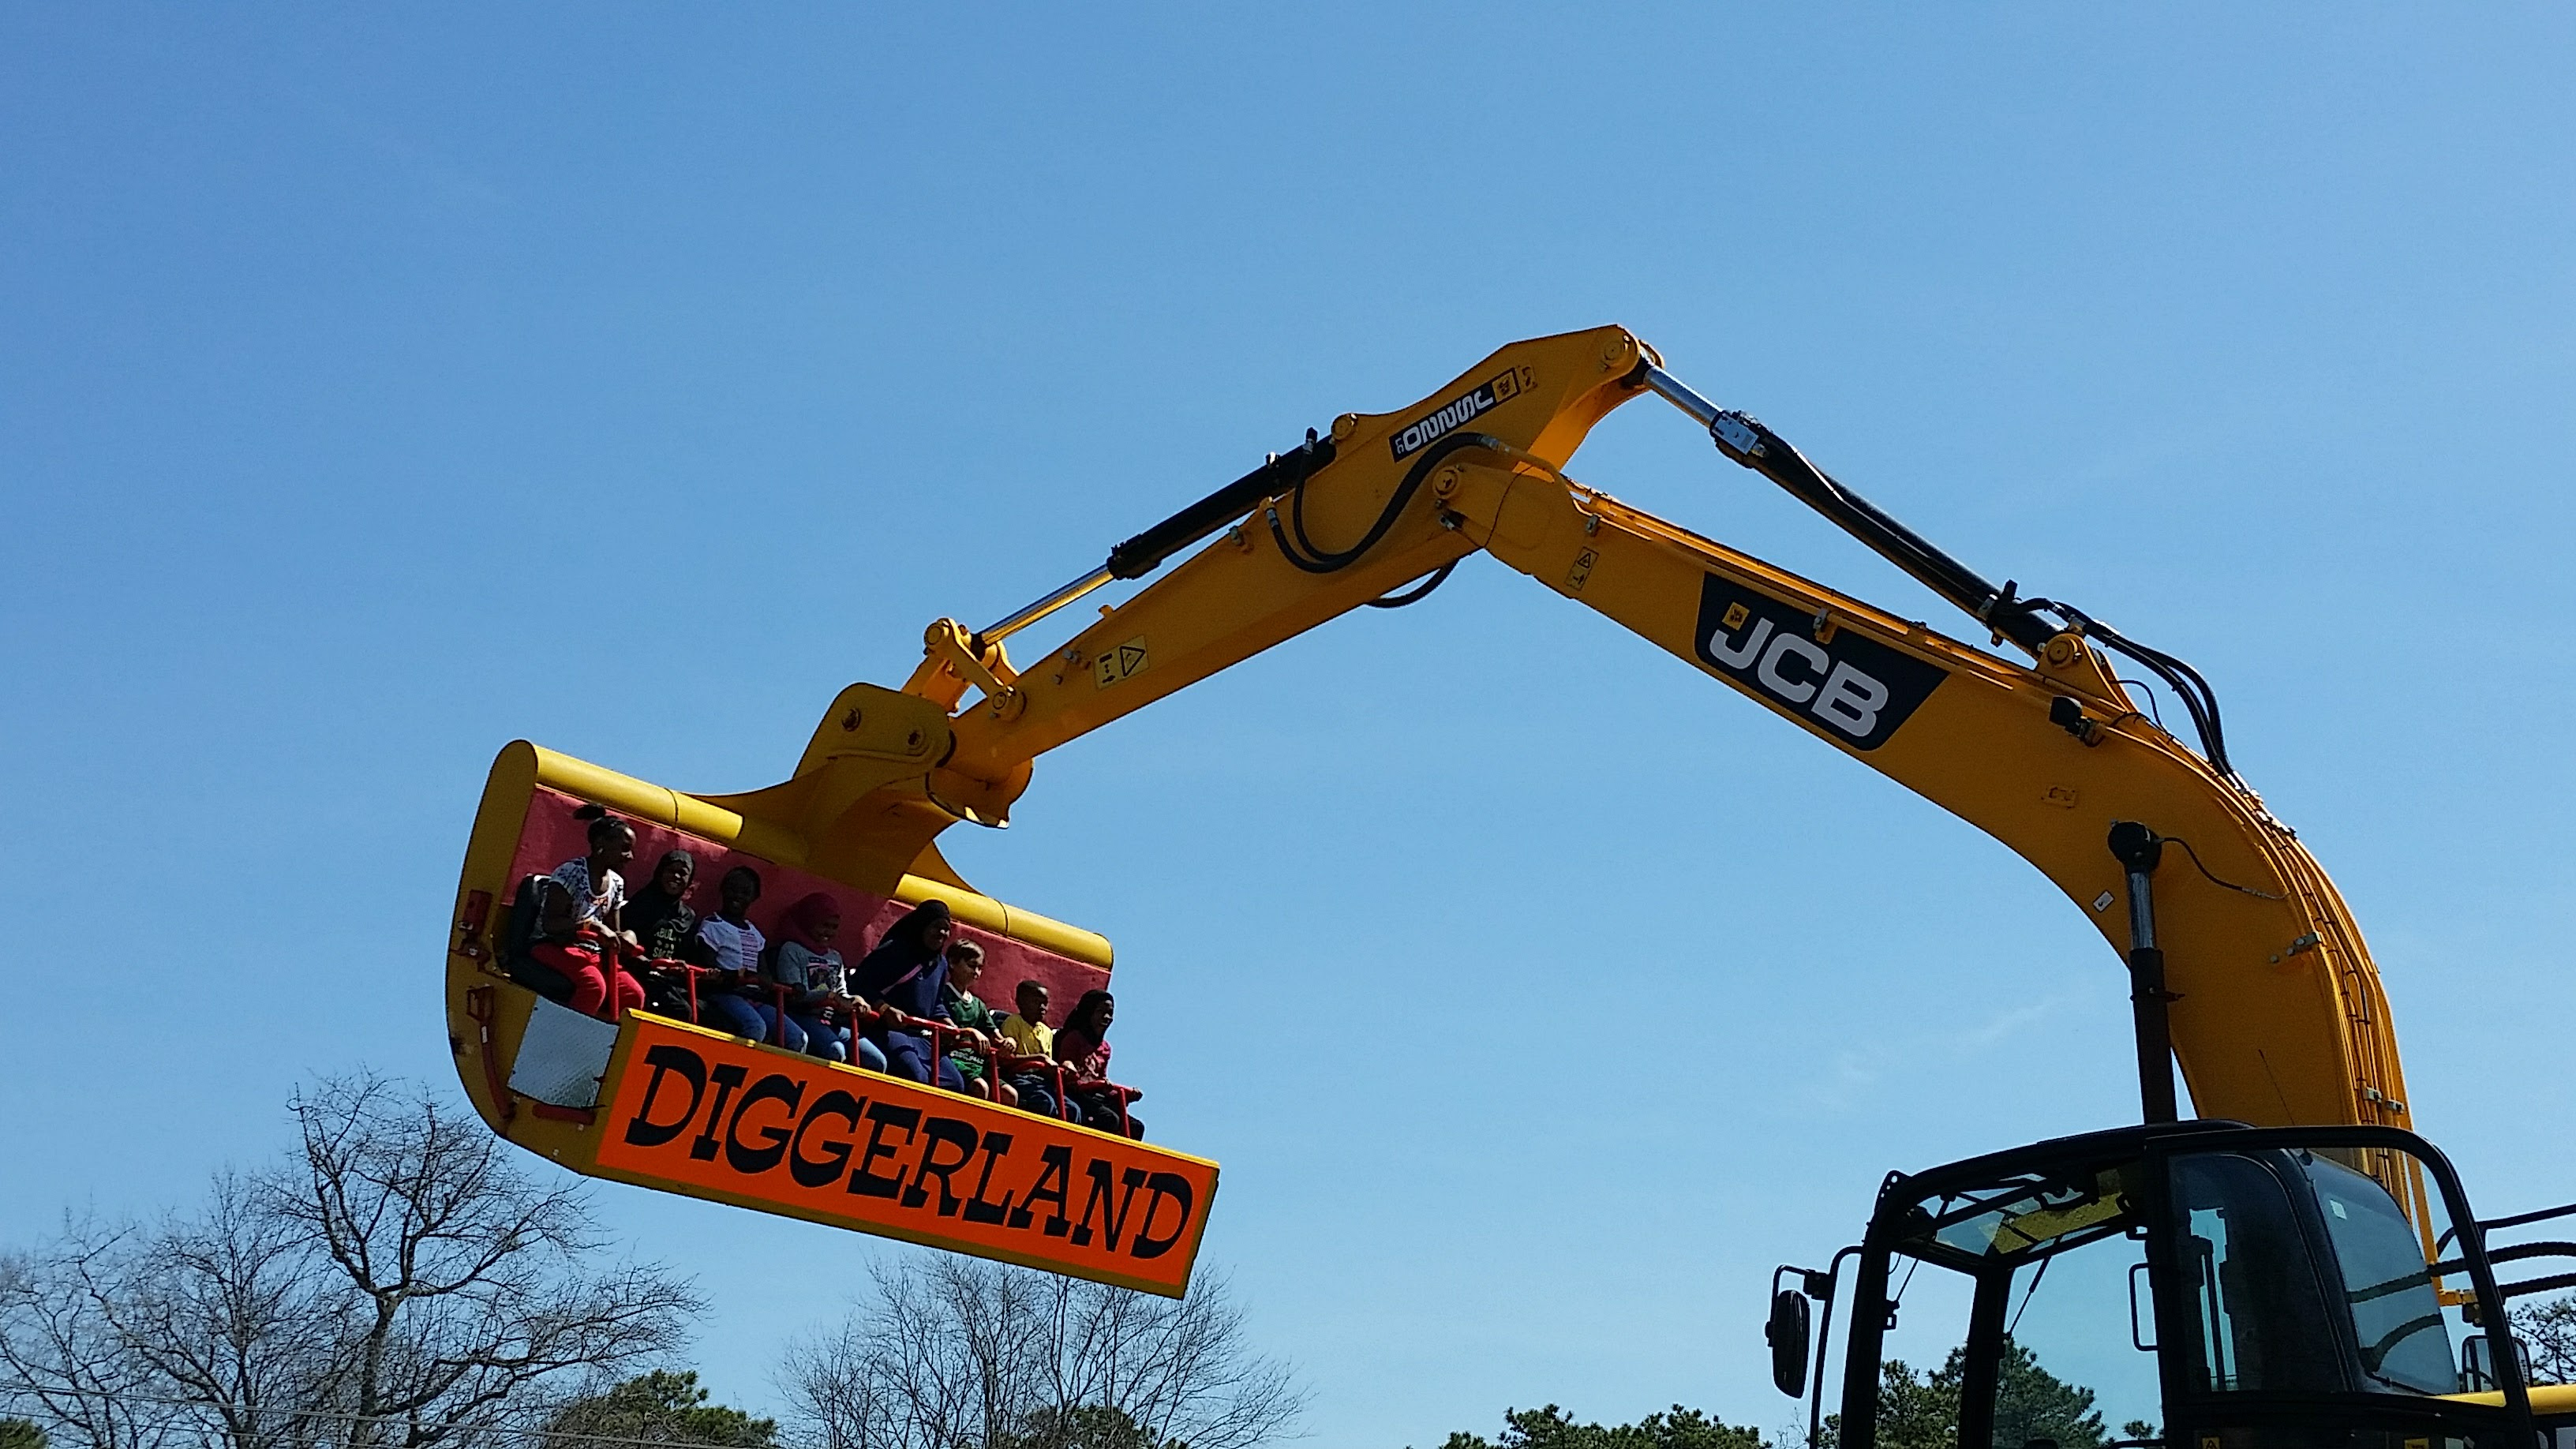 Spin Dizzy ride at Diggerland USA theme park